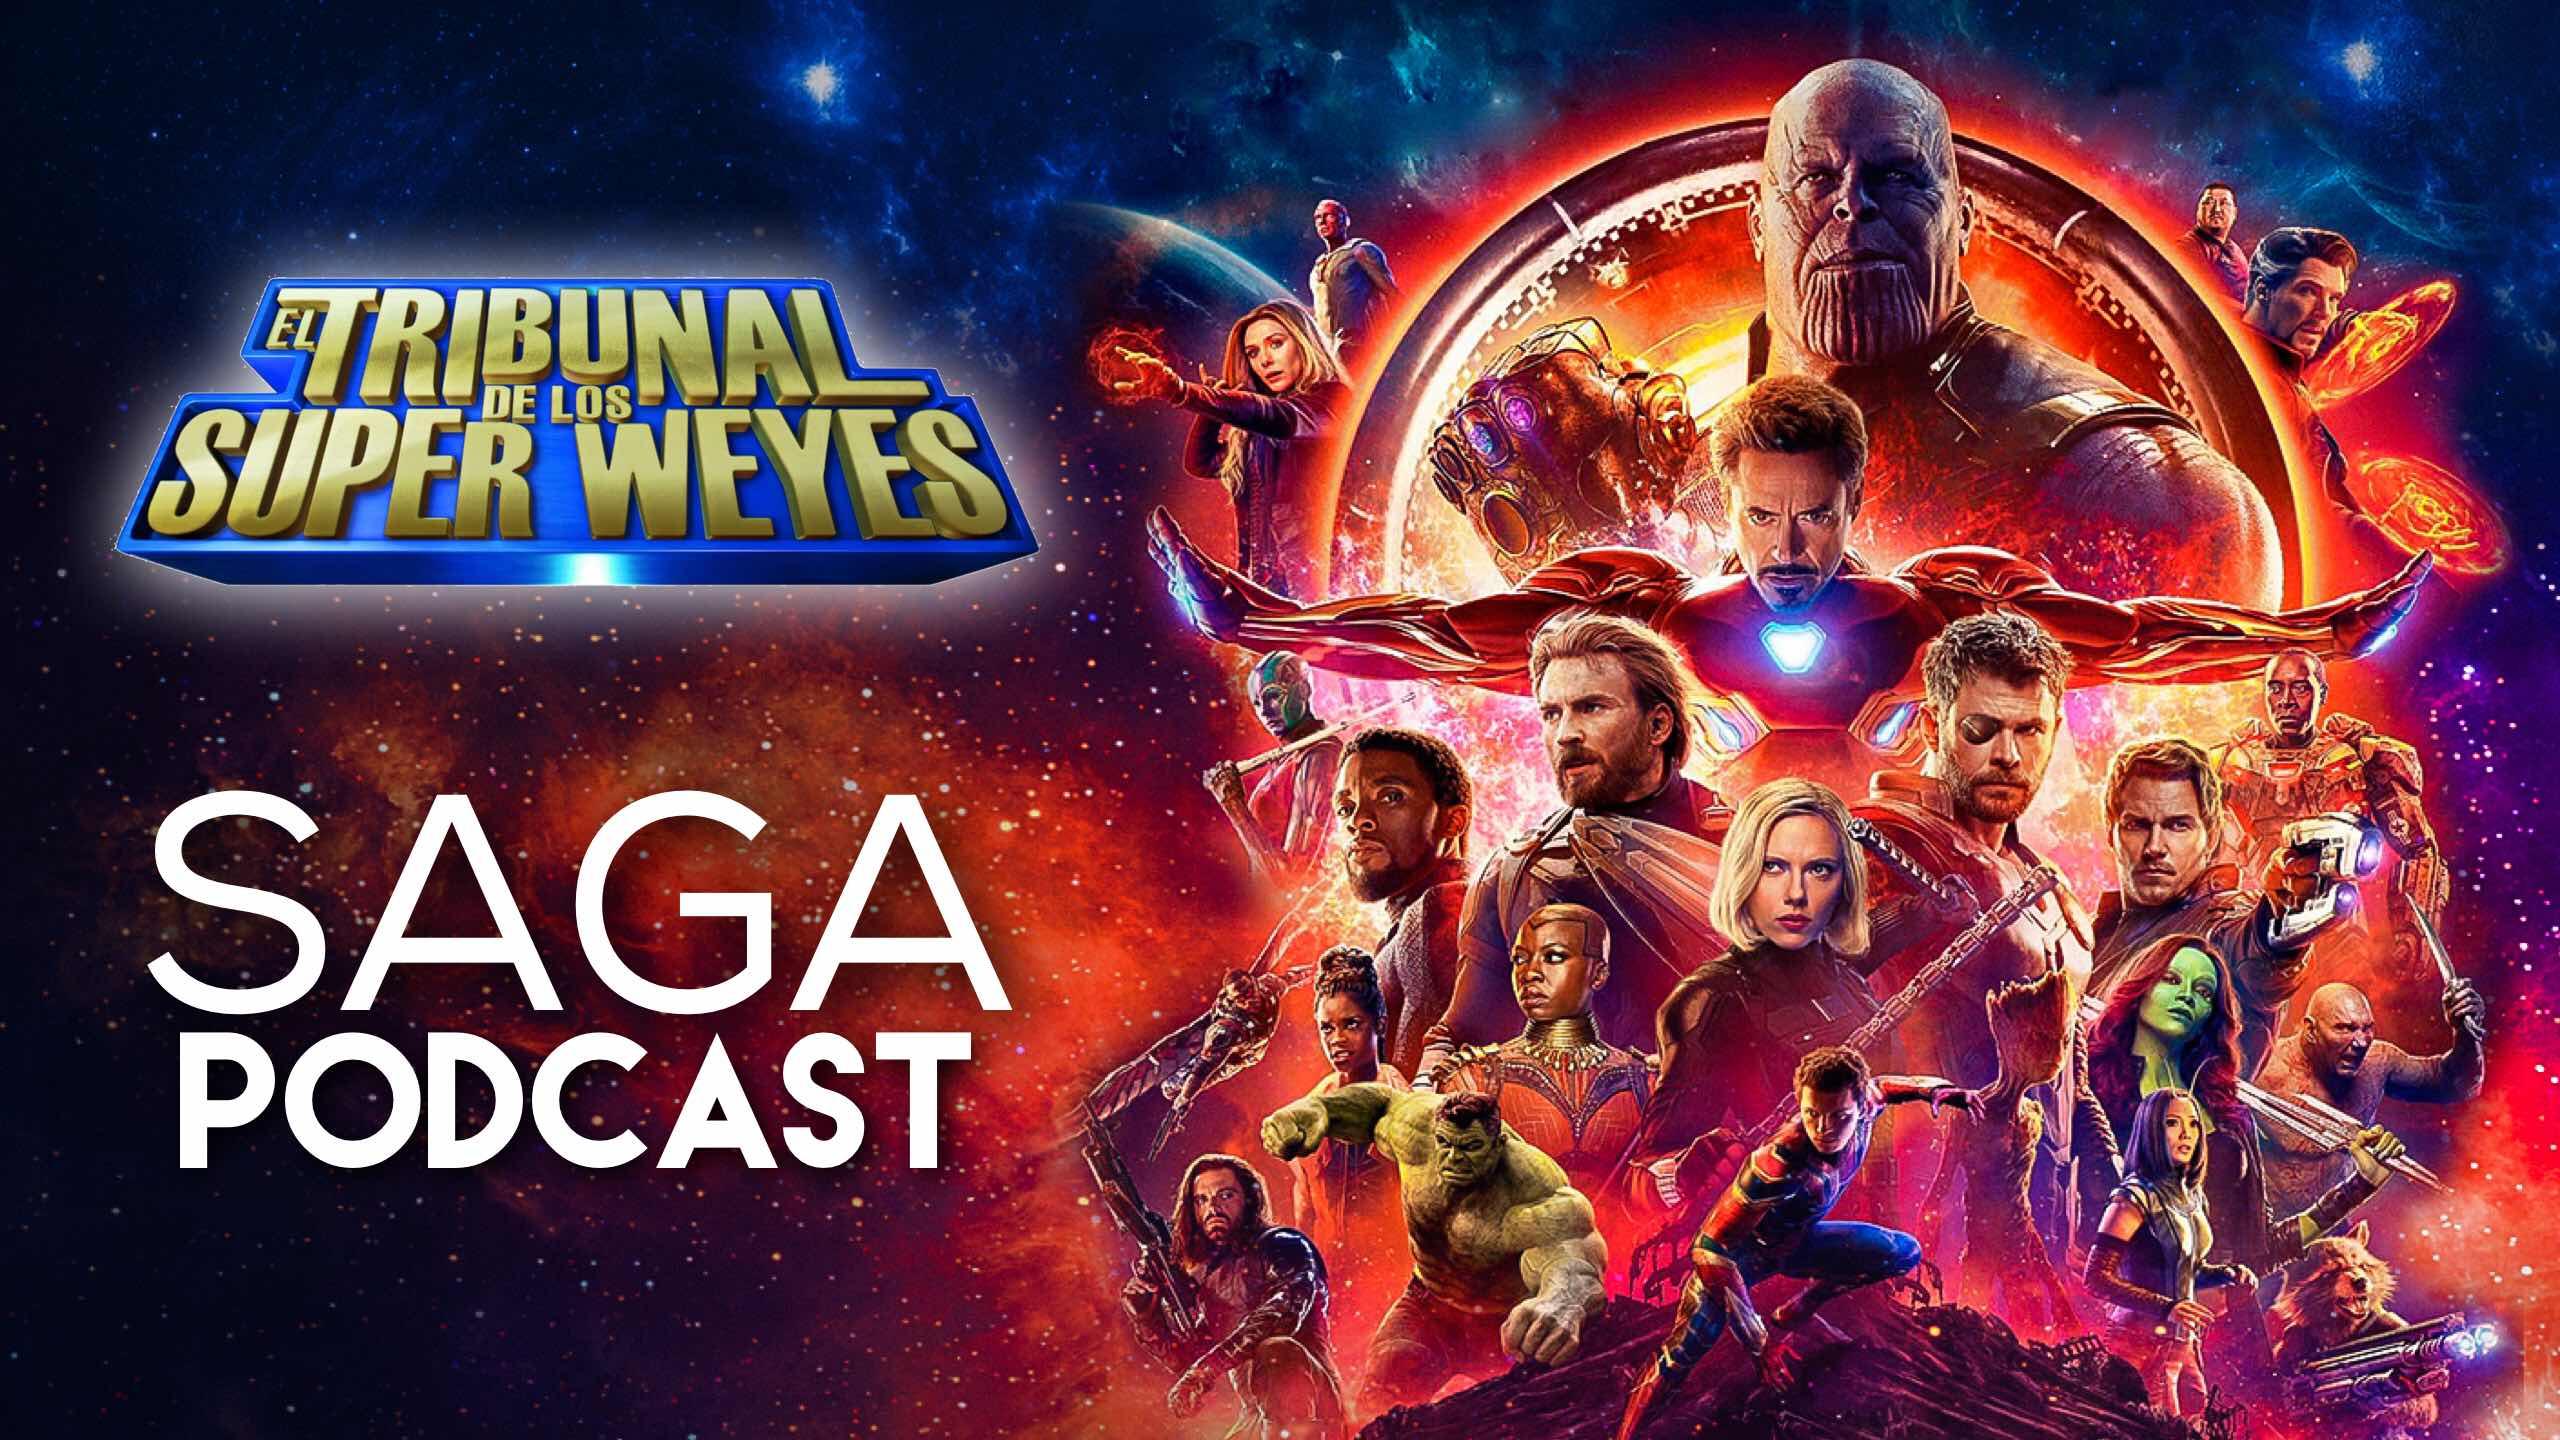 Superweyes Infinity war